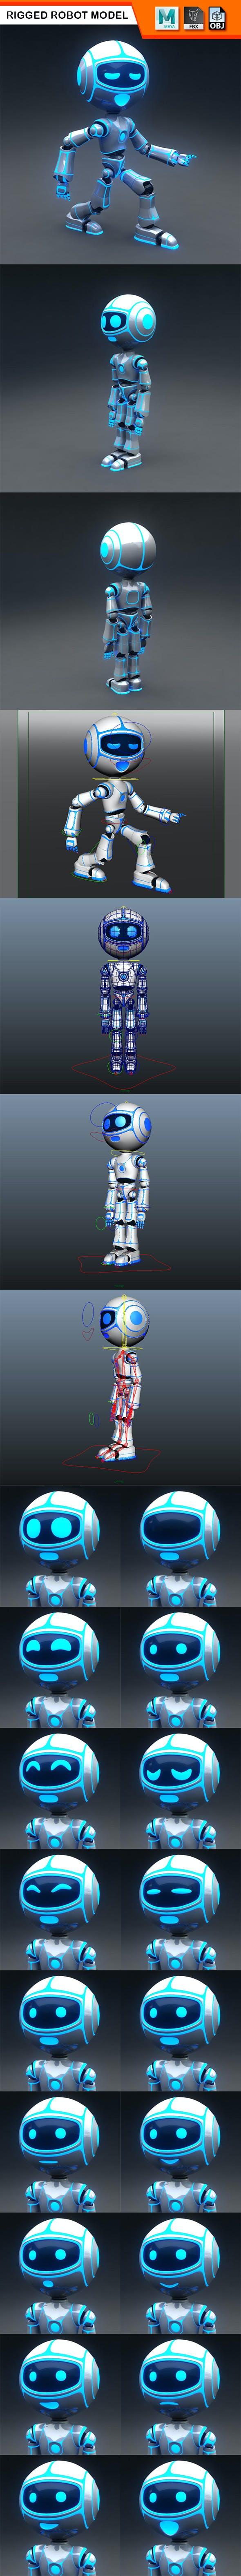 Full Rigged Robot Model - 3DOcean Item for Sale